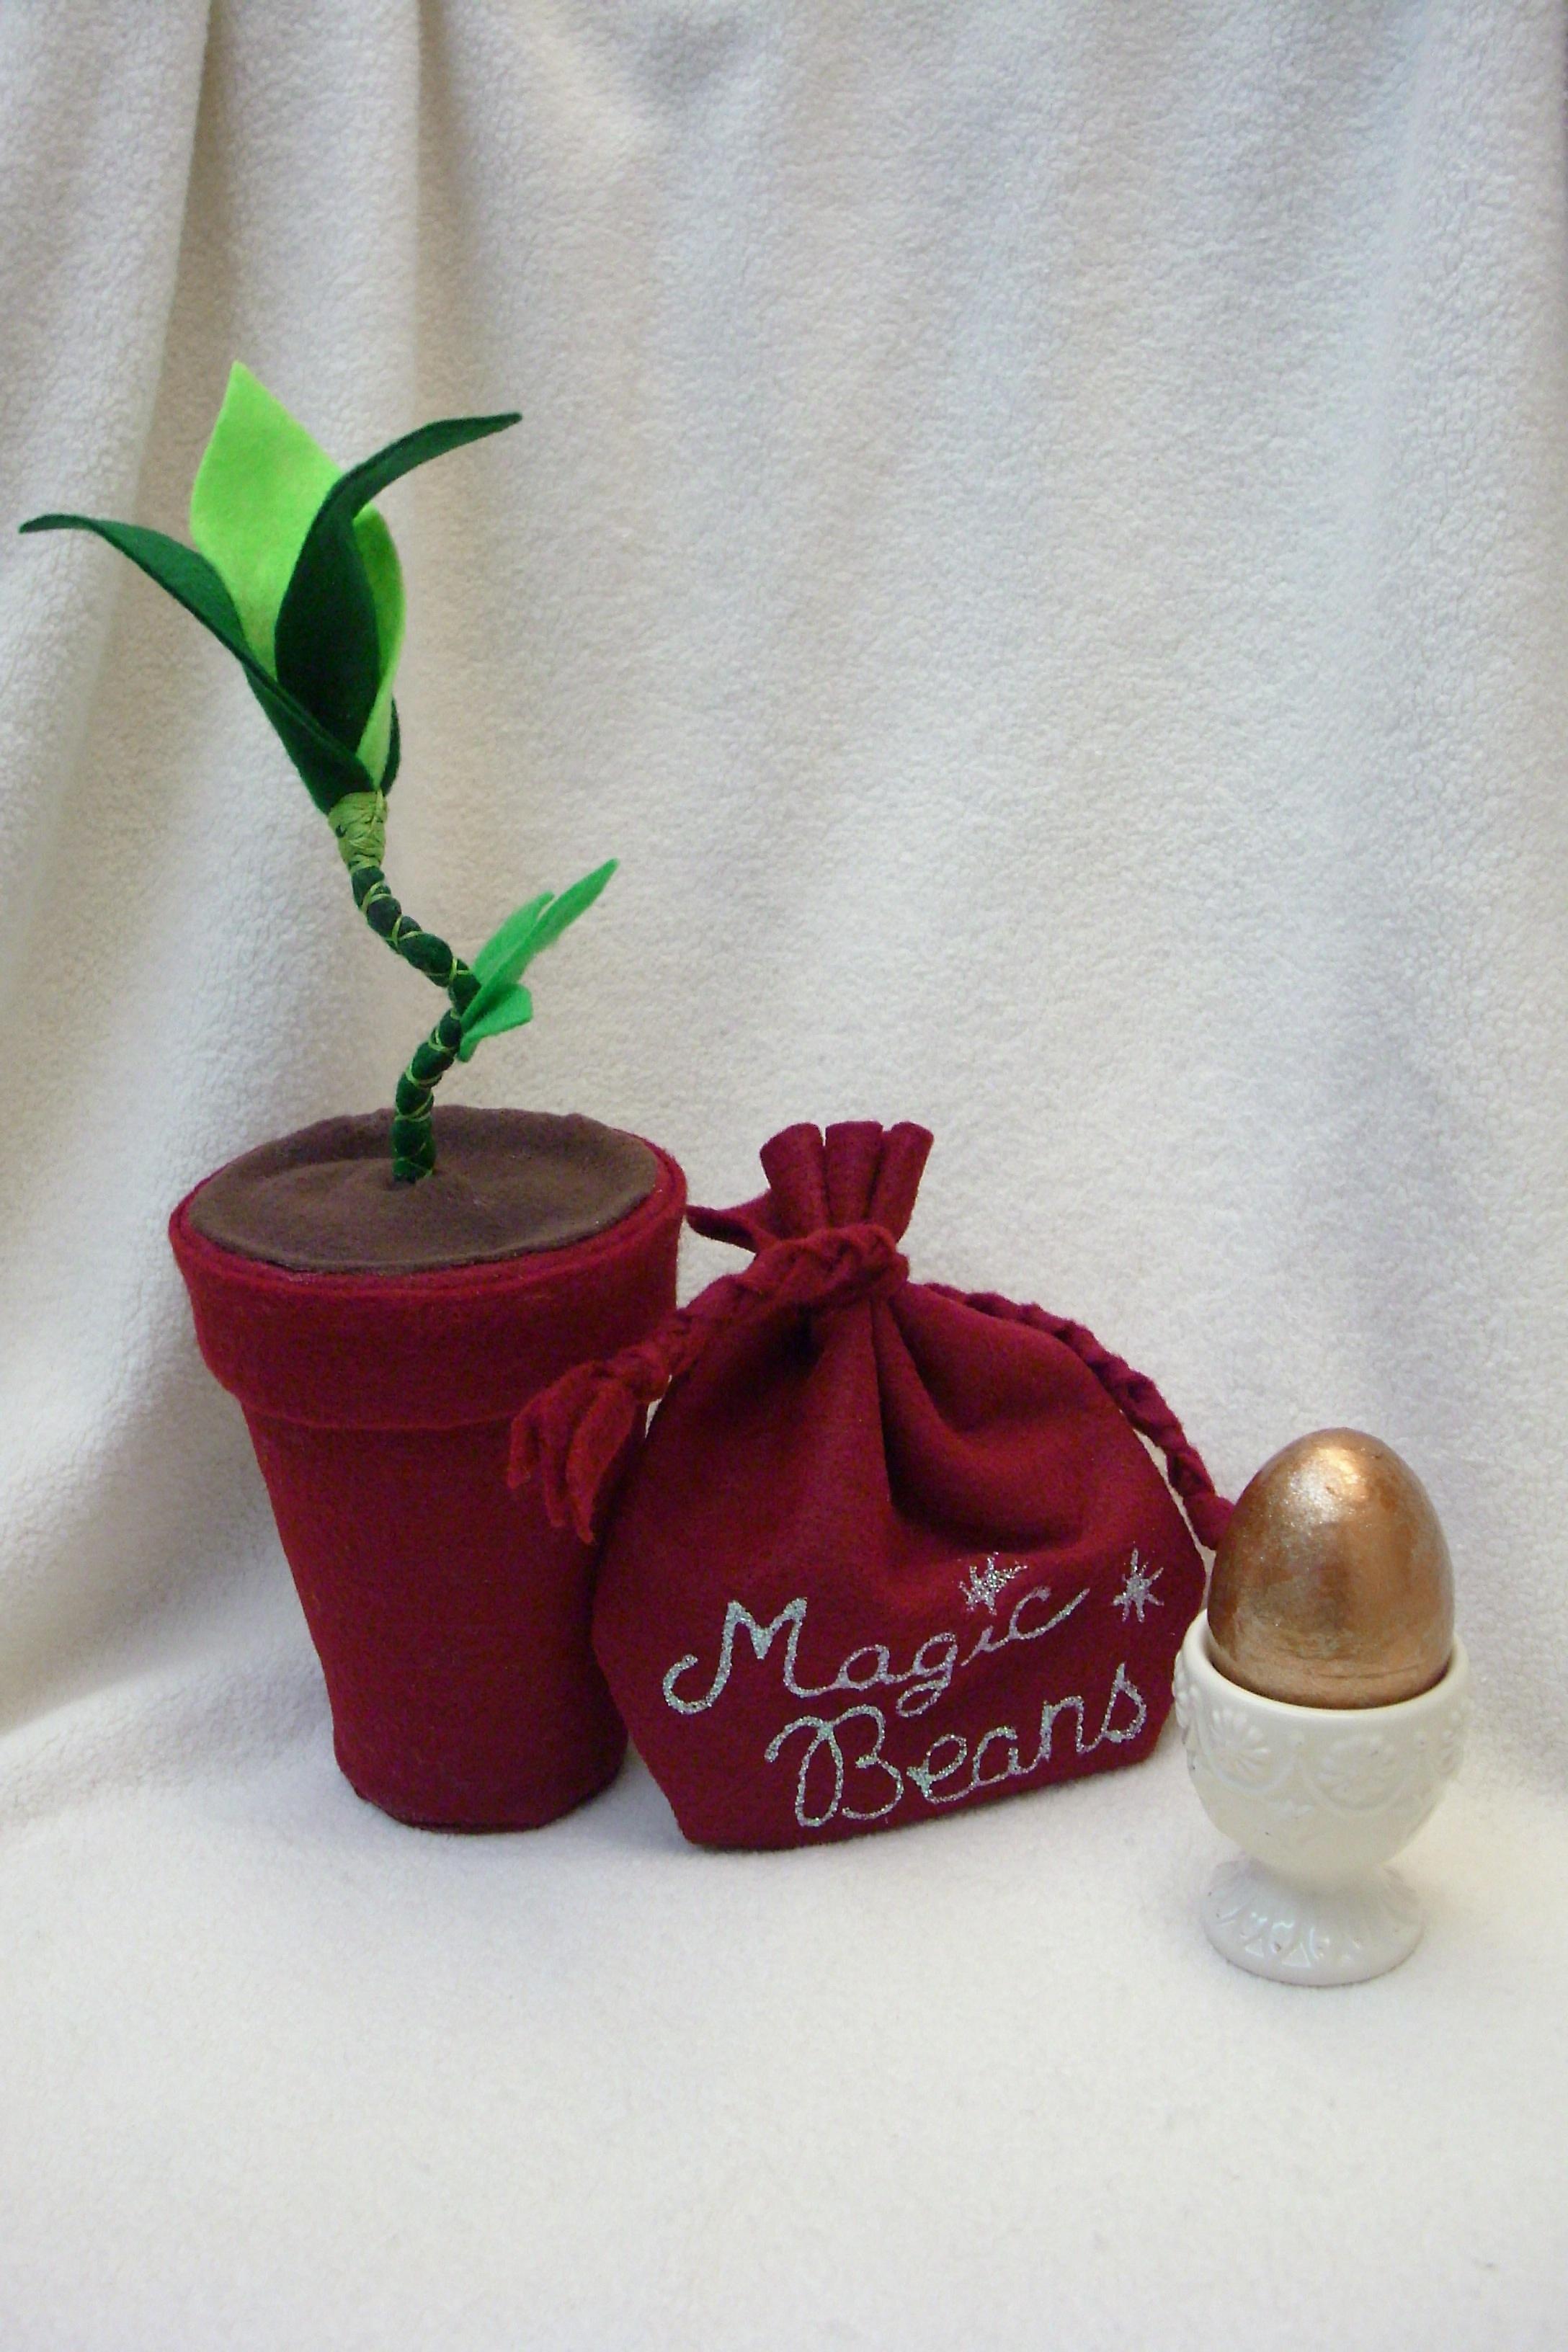 Bean Stalk, Magic Beans & Golden Egg